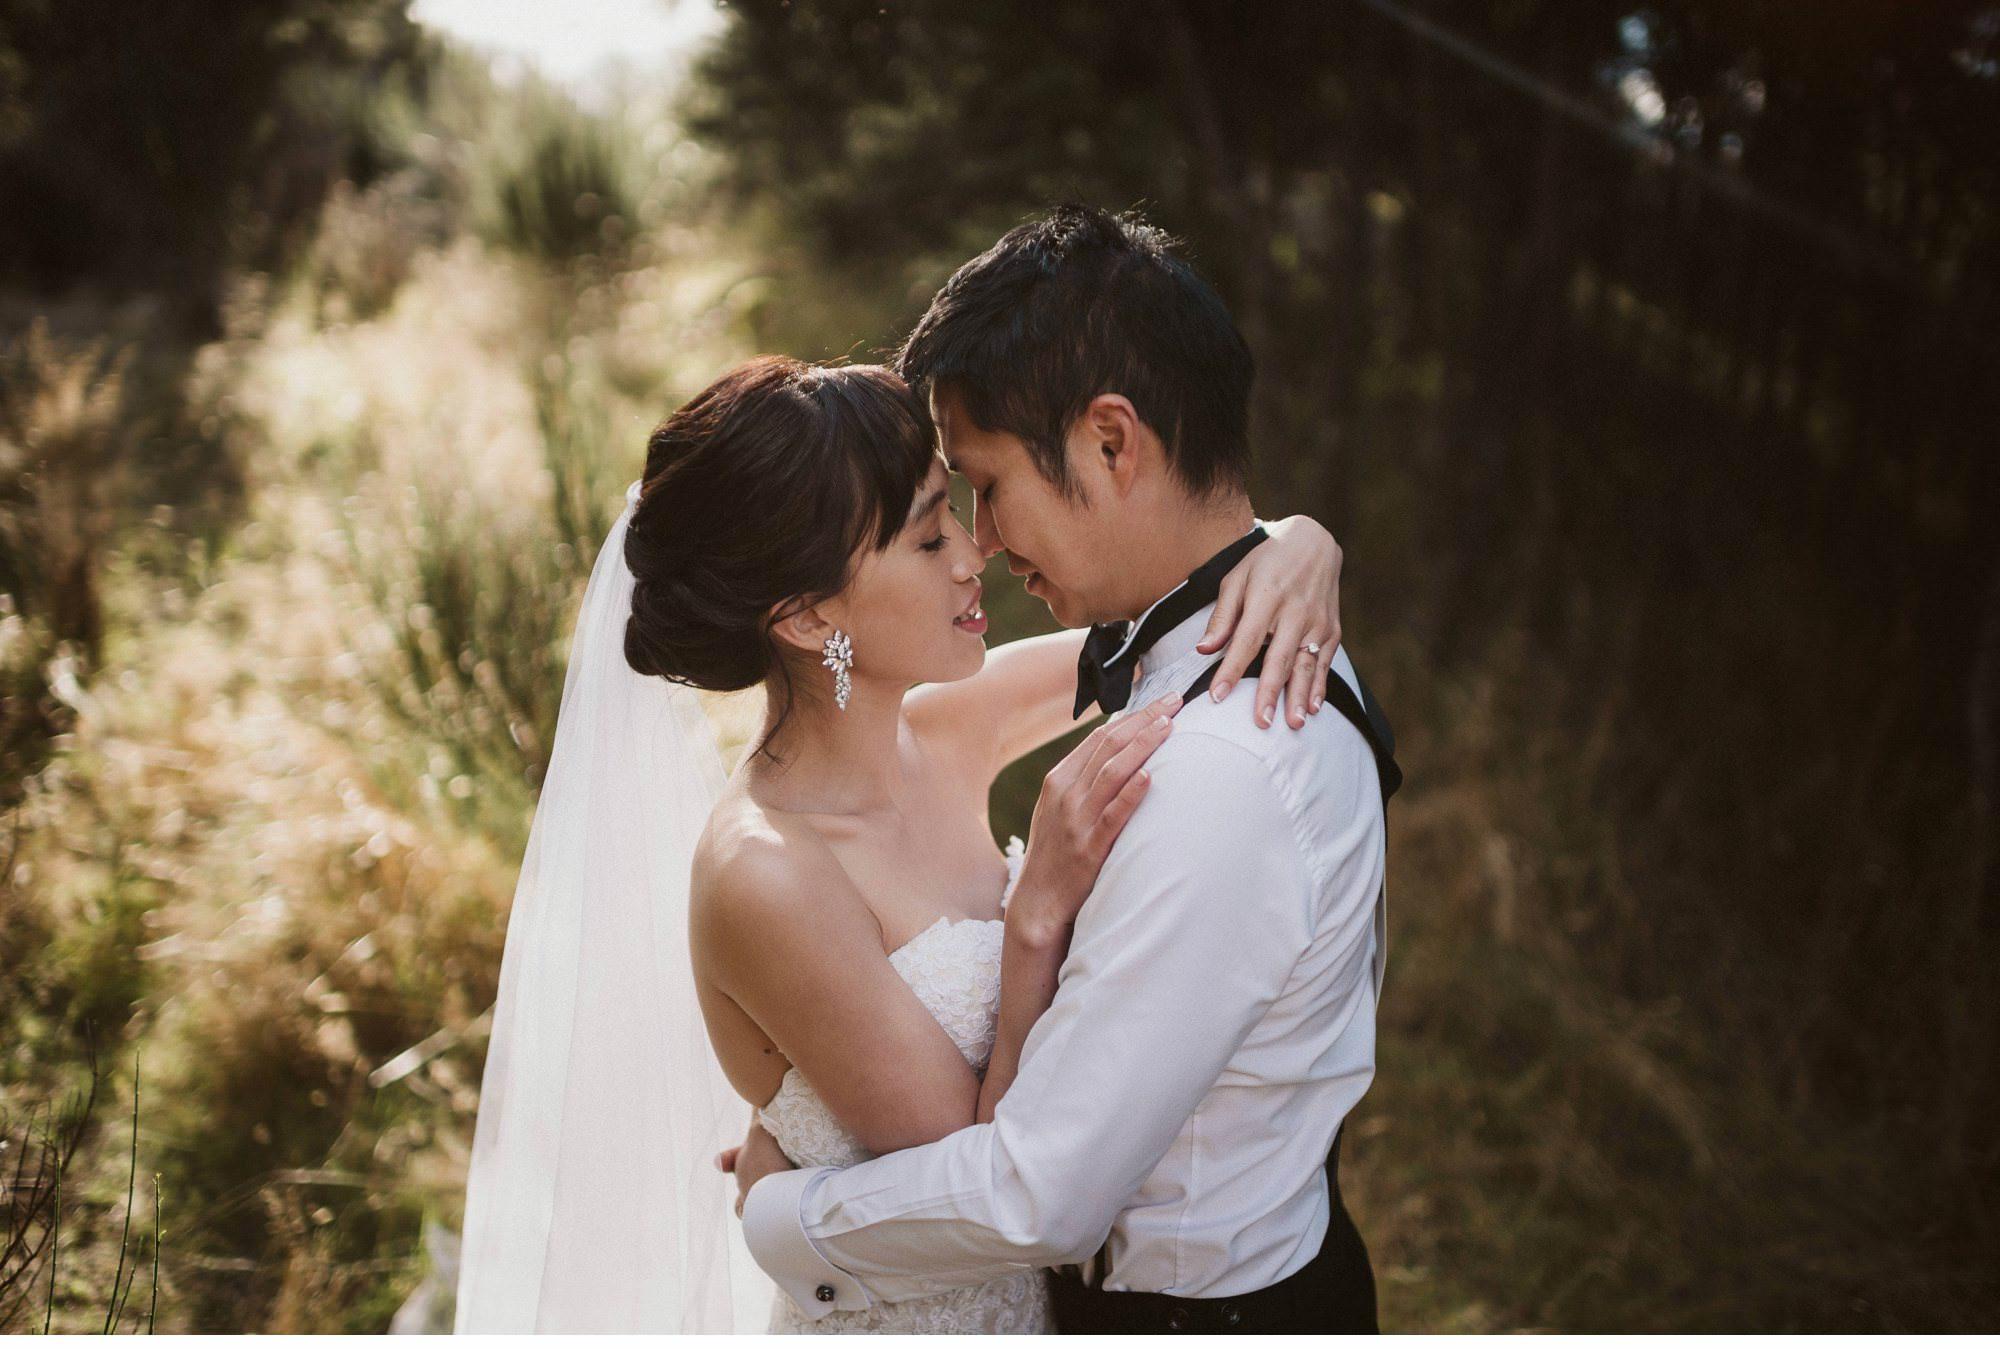 Isobel Glacier Pre Wedding Photography-030.jpg